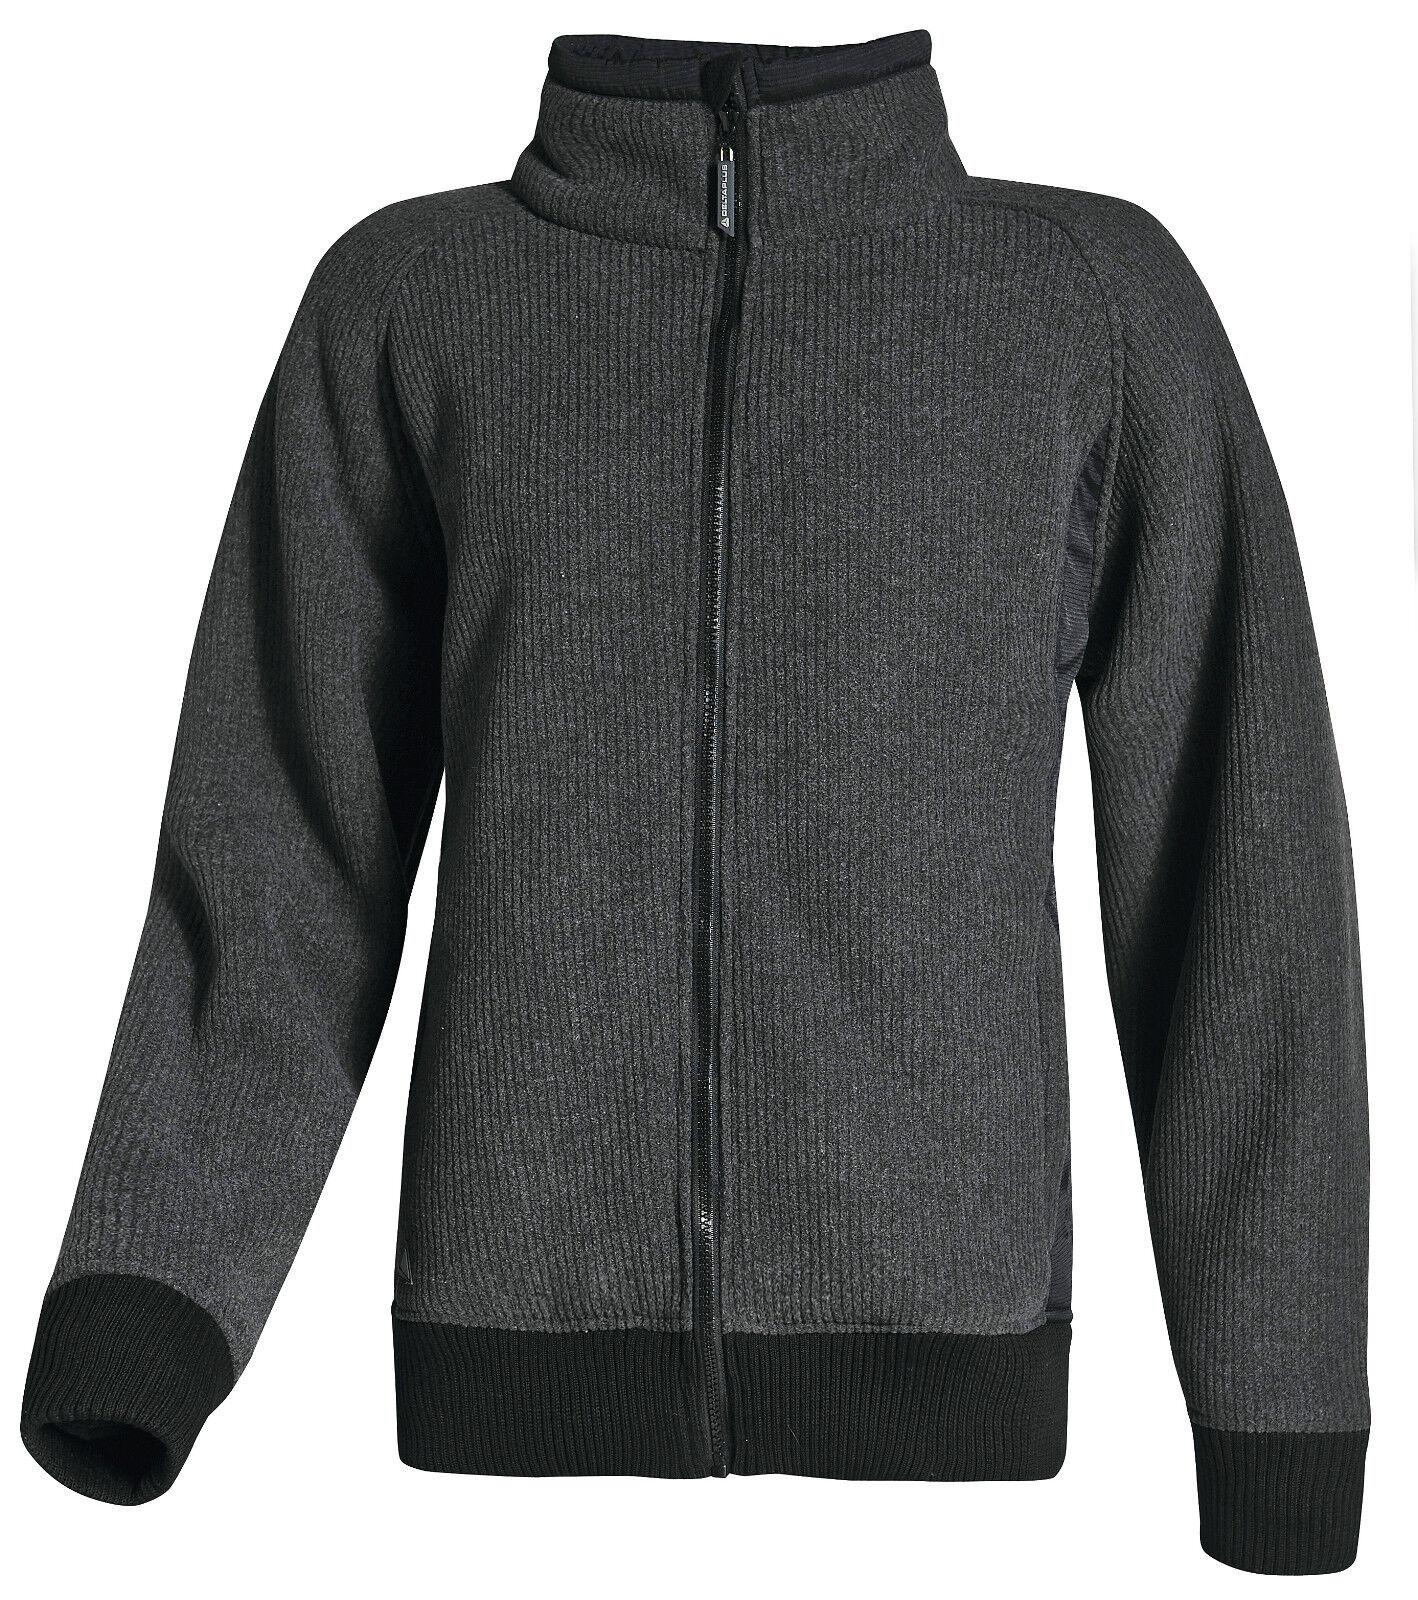 Delta Plus Panoply Lurgan Grey Mens Polar Fleece Jacket Coat Winter Top BNWT